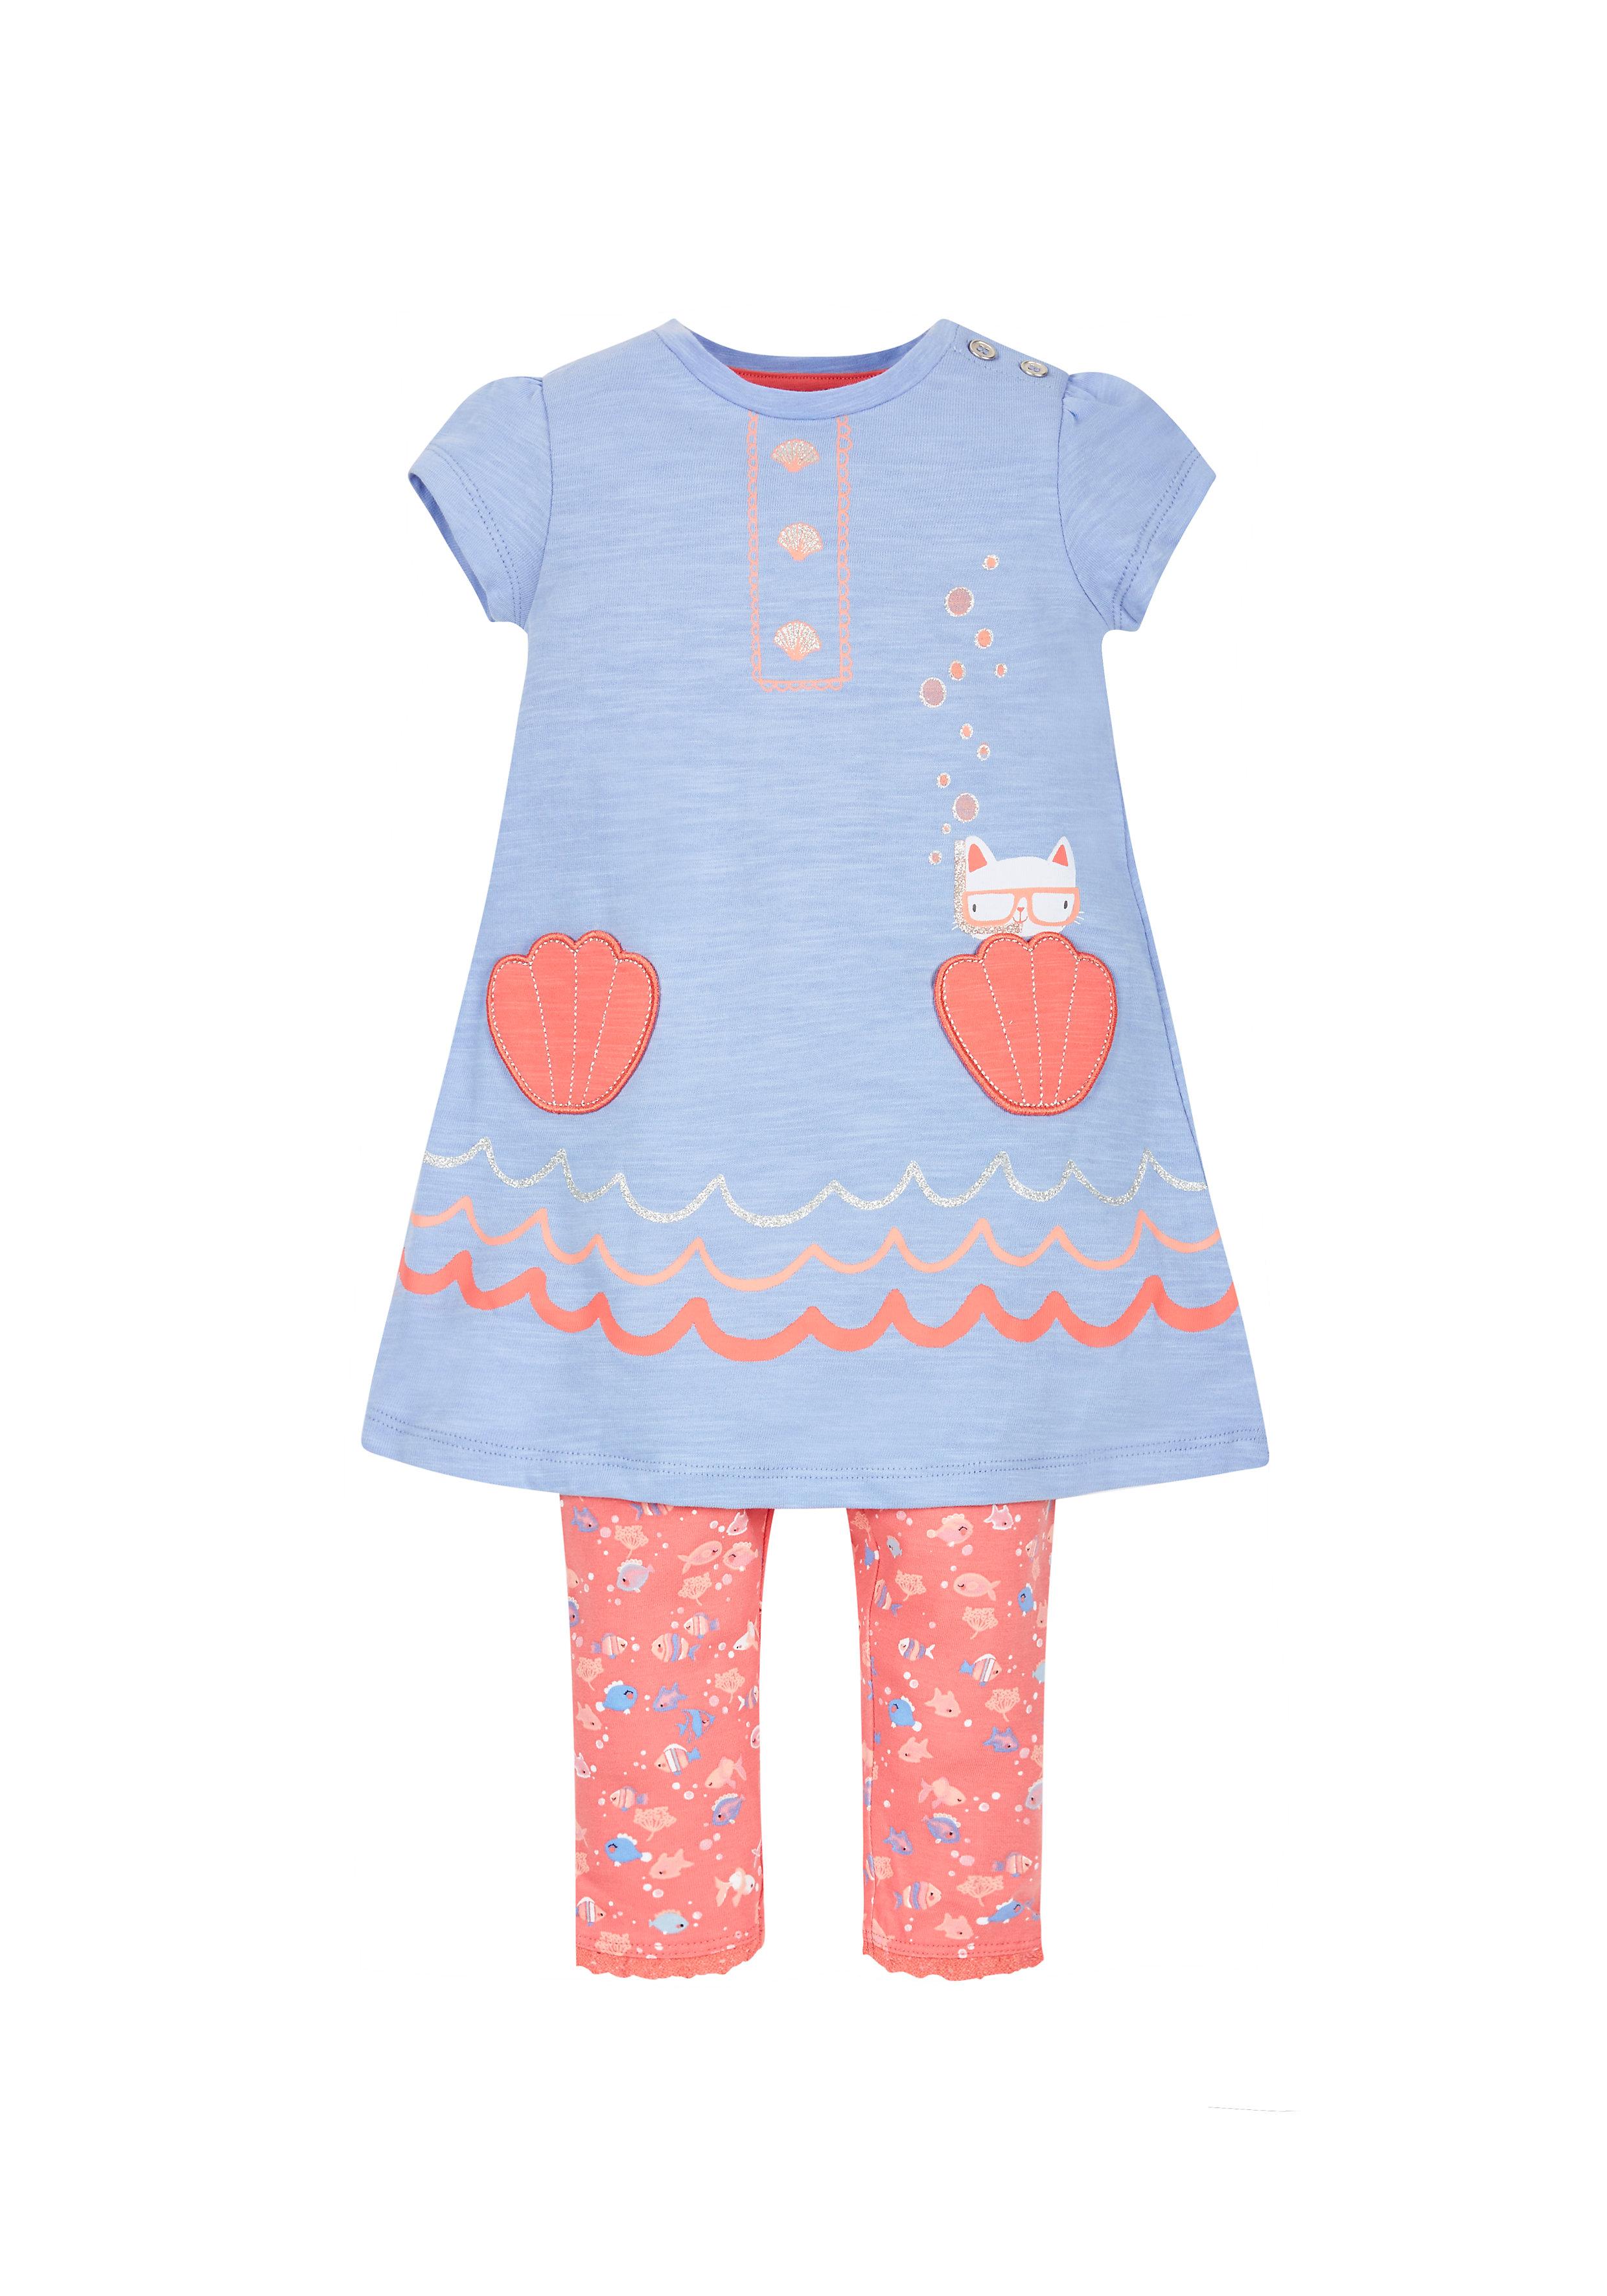 Mothercare | Girls Shell Pockets Dress And Leggings Set - Blue